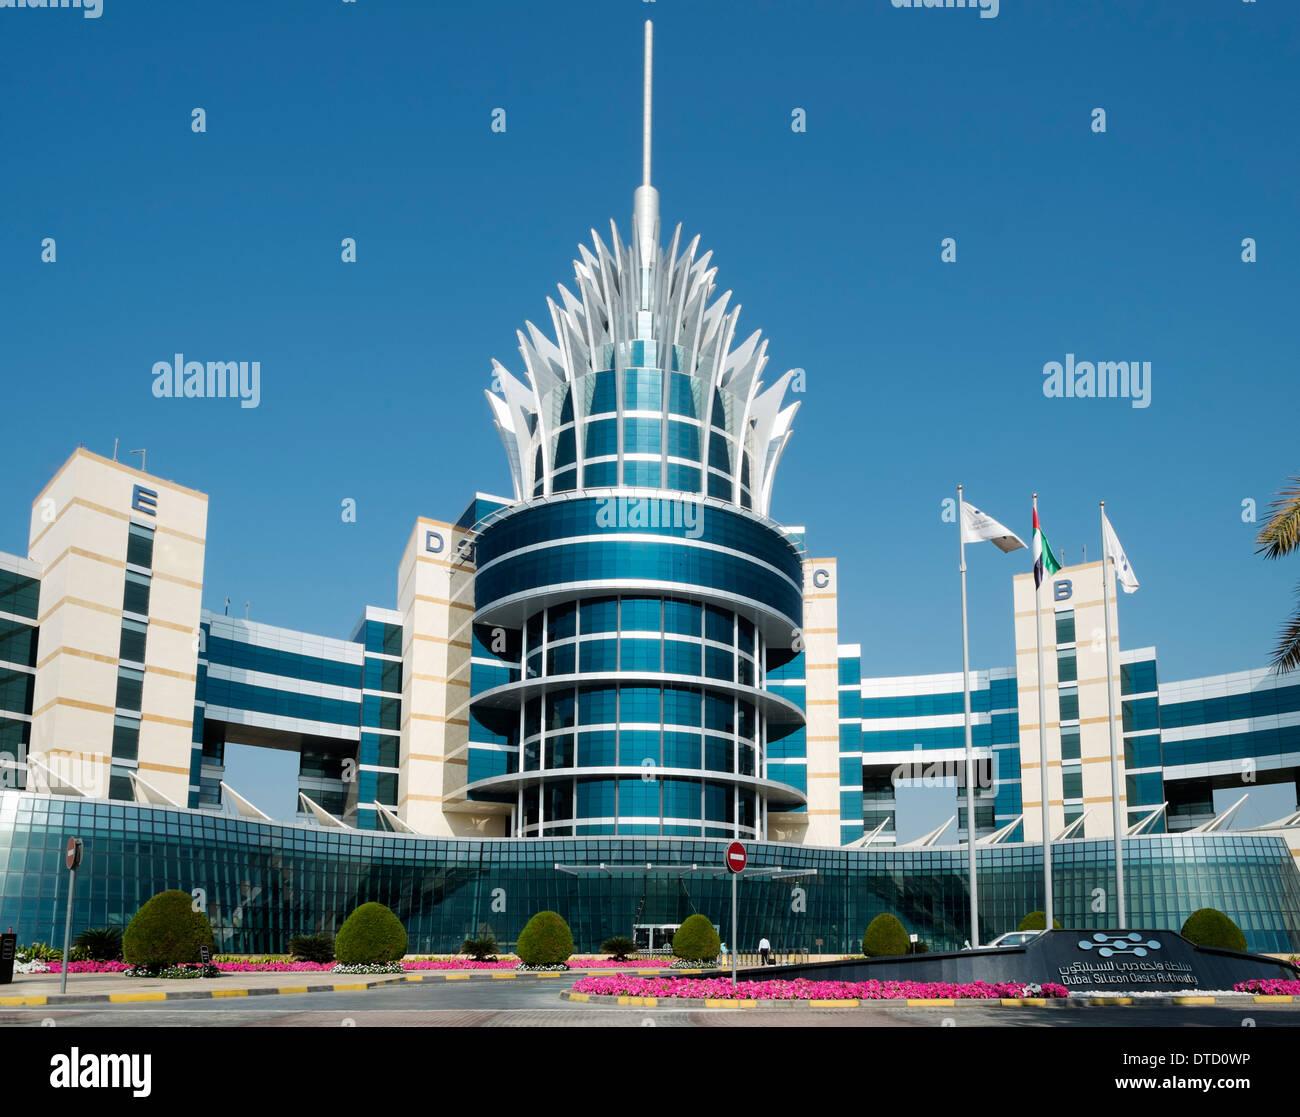 Dubai Silicon Oasis Authority Building in Dubai United Arab Emirates - Stock Image